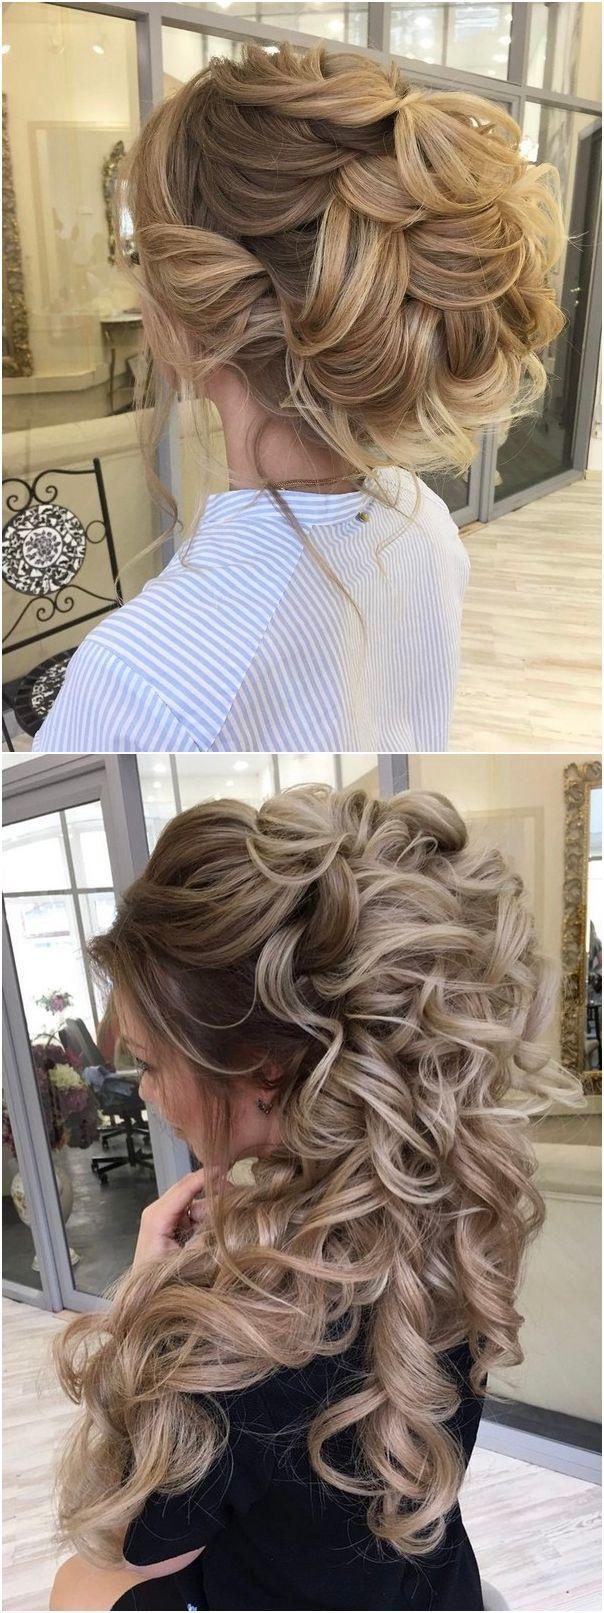 Long wedding updos and hairstyles from Elstile #weddings #weddingideas #hairstyles / http://www.deerpearlflowers.com/new-long-wedding-hairstyles-updos/